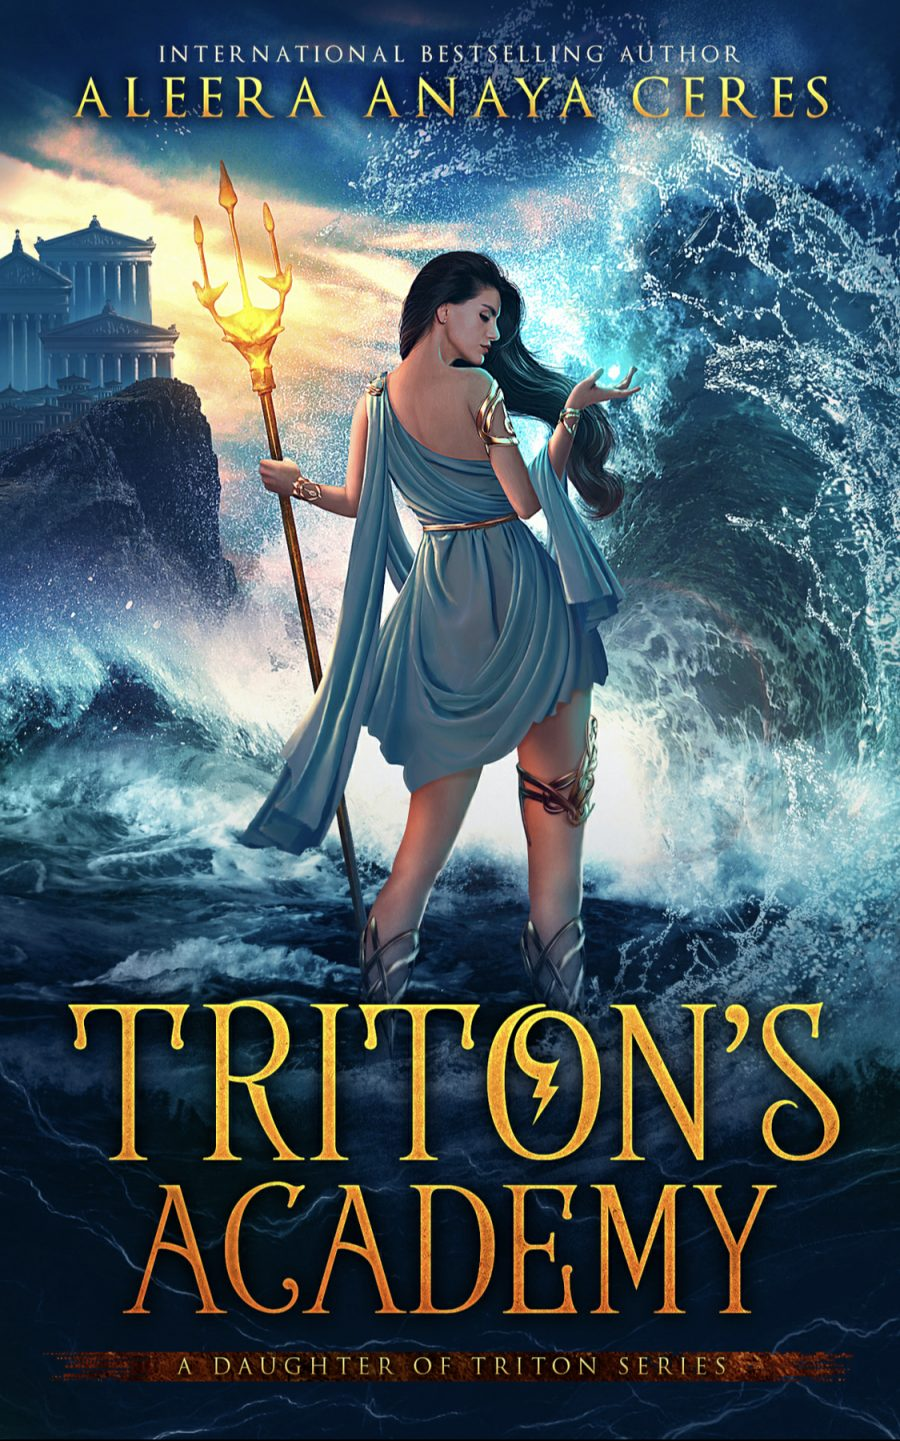 Triton's Academy by Aleera Anaya Ceres - A Book Review #BookReview #MediumBurn #RH #ReverseHarem #Mermaids #Gods #WhyChoose #Academy #4Stars #KindleUnlimited #KU